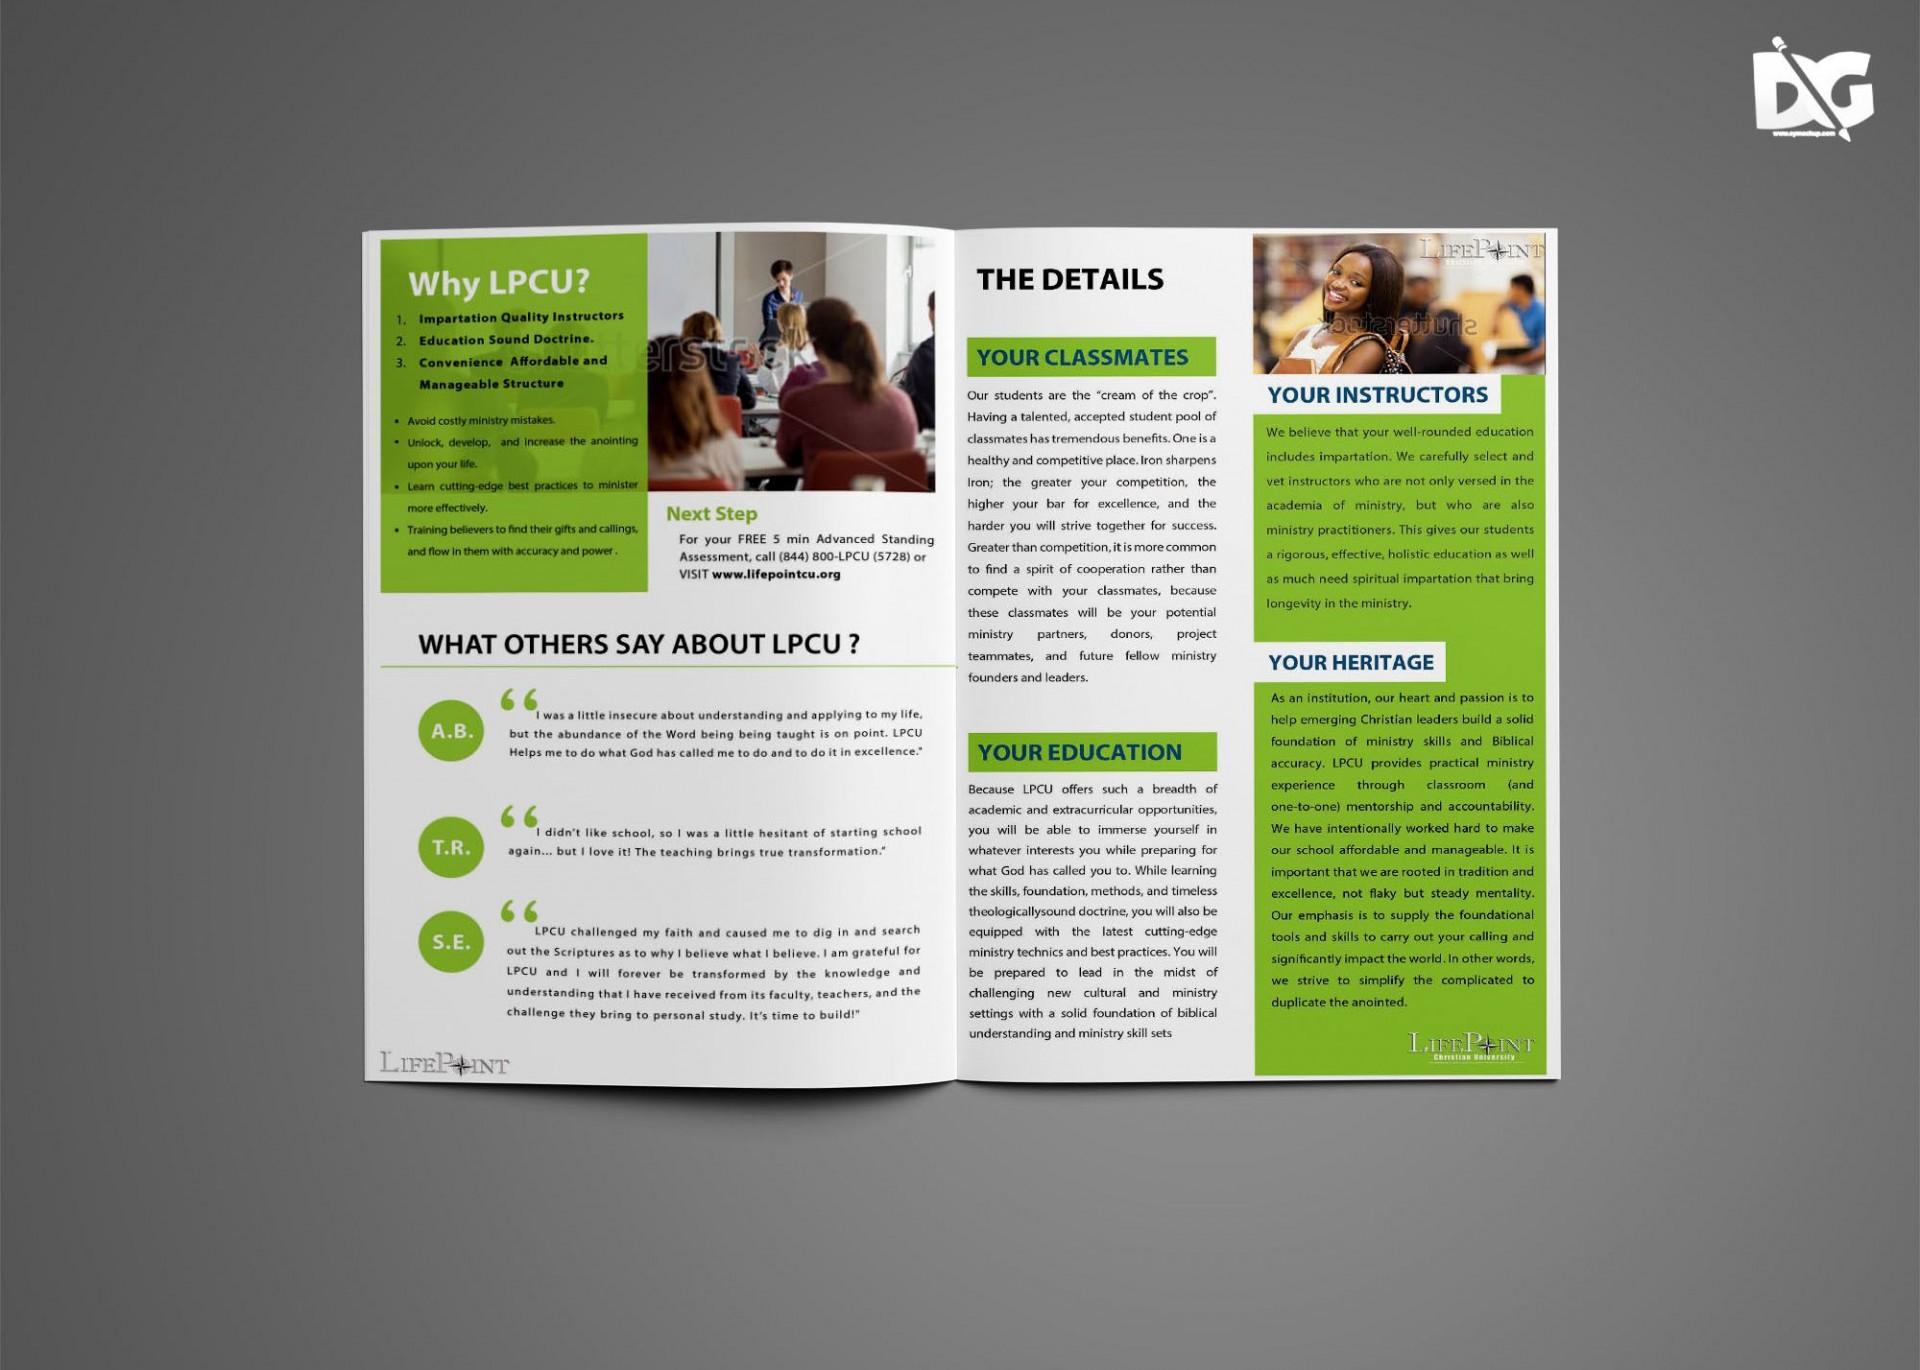 008 Stunning Bi Fold Brochure Template Word Picture  Free Download Microsoft1920